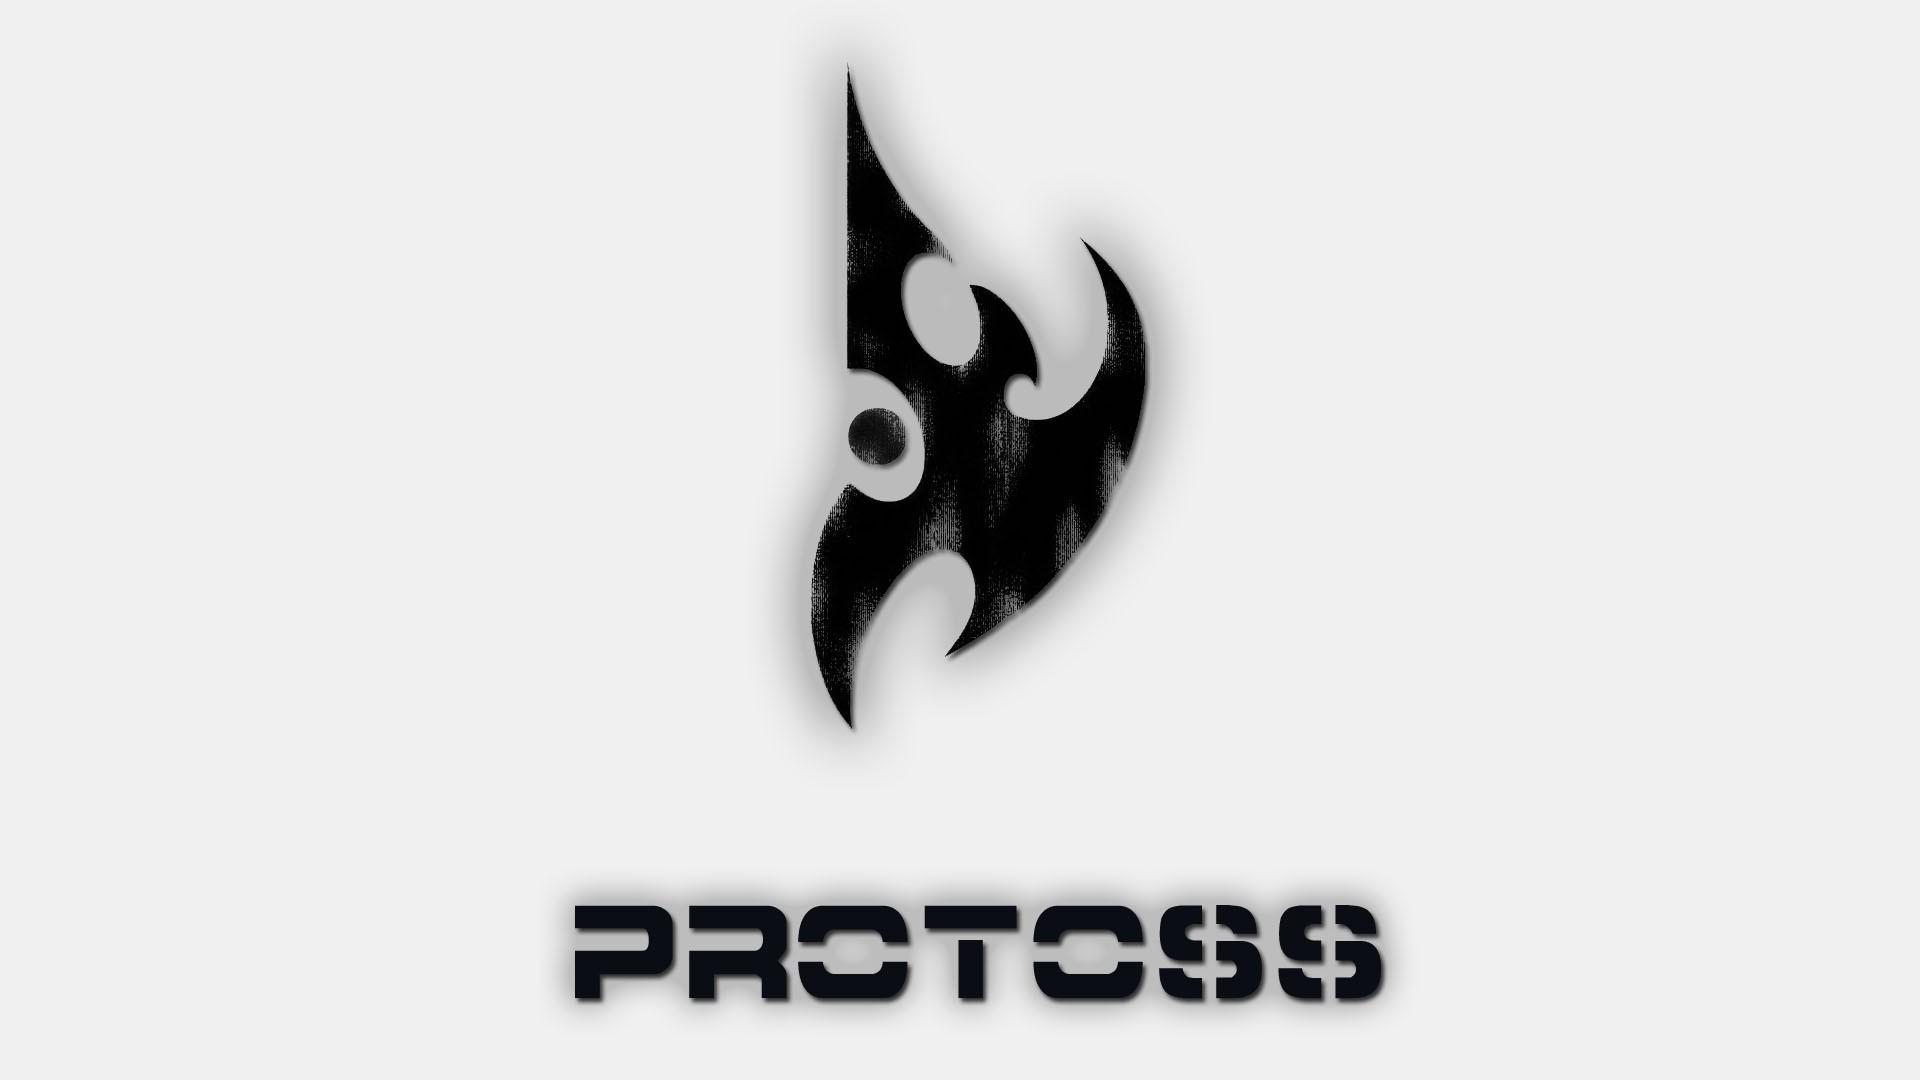 StarCraft, Starcraft II, Protoss Wallpapers HD / Desktop and Mobile  Backgrounds